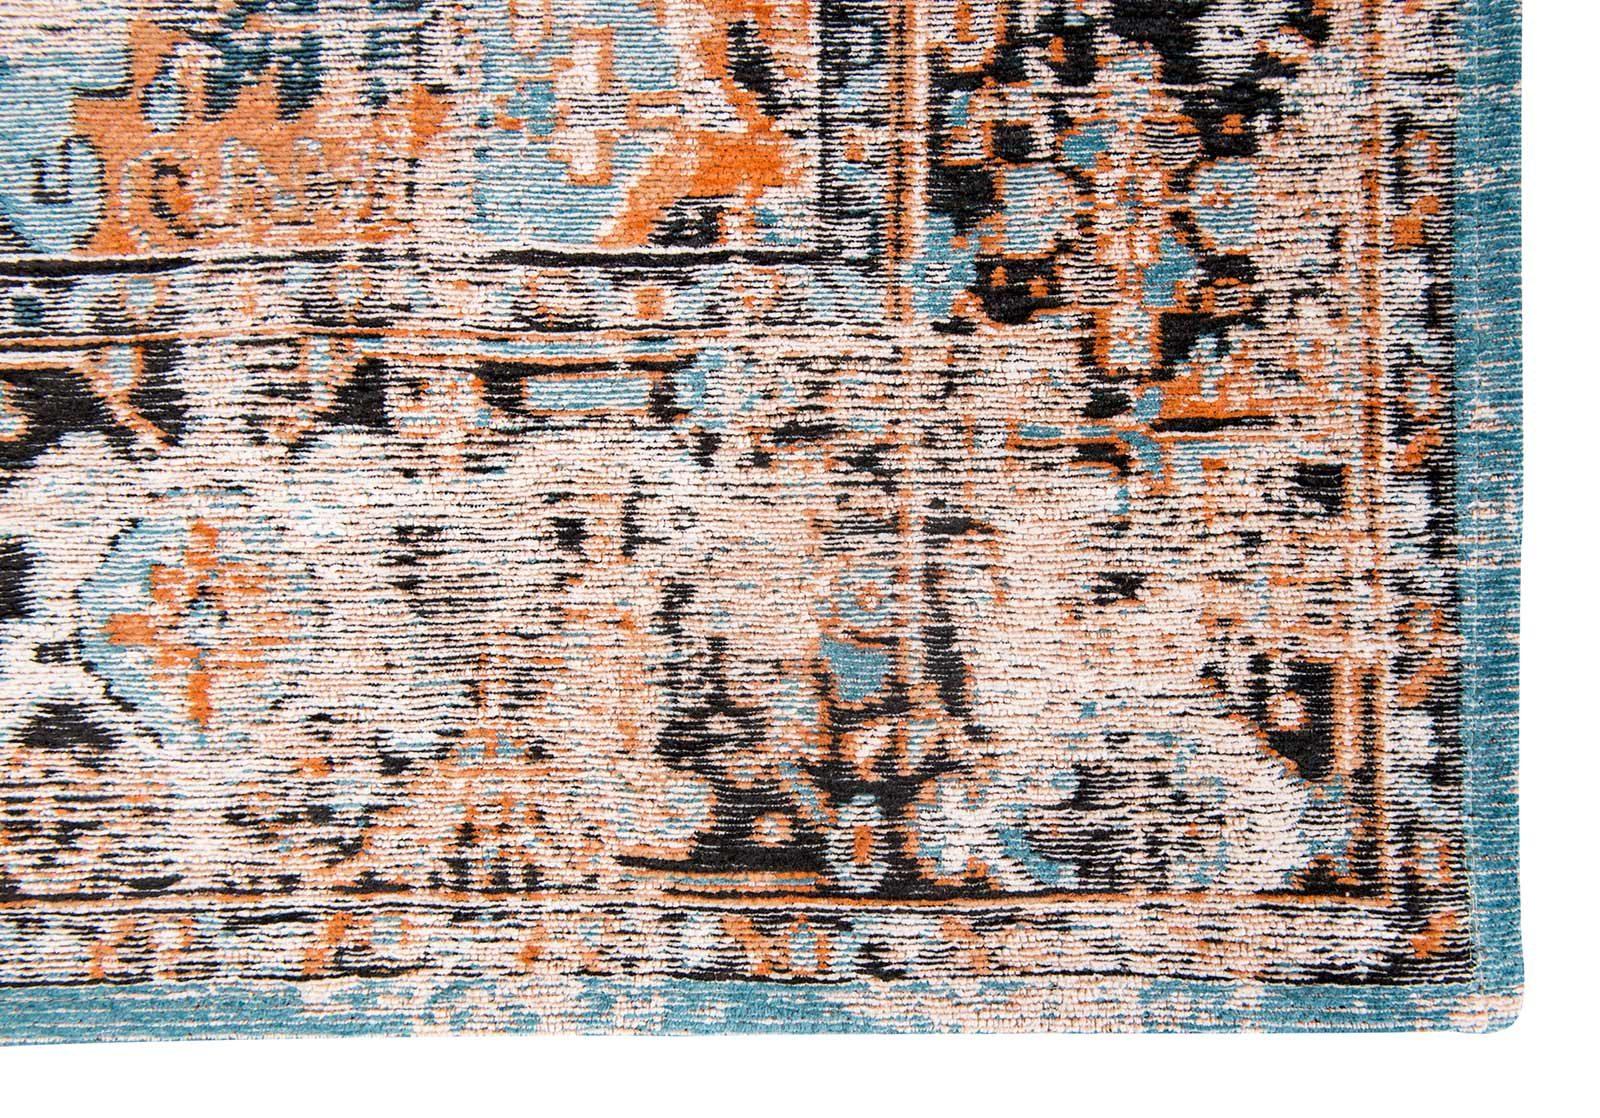 rugs Louis De Poortere LX8705 Antiquarian Antique Heriz Seray Orange corner